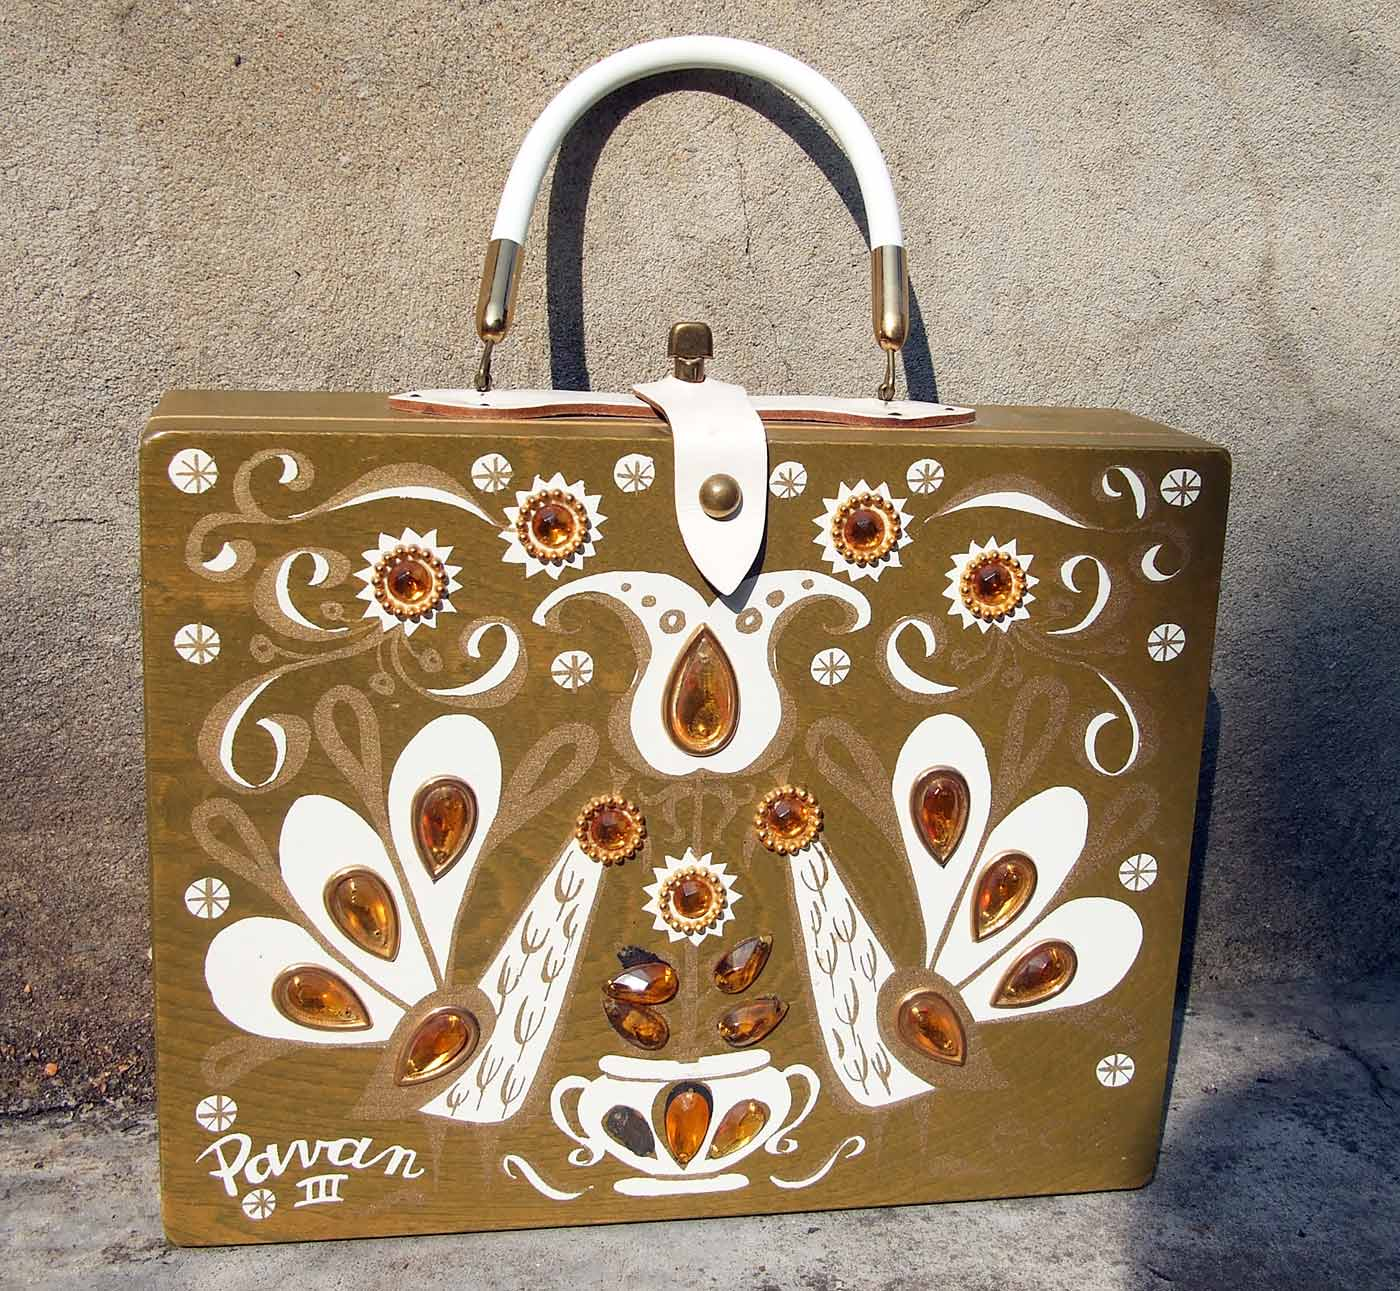 Enid Collins Pavan III box handbag 1960s